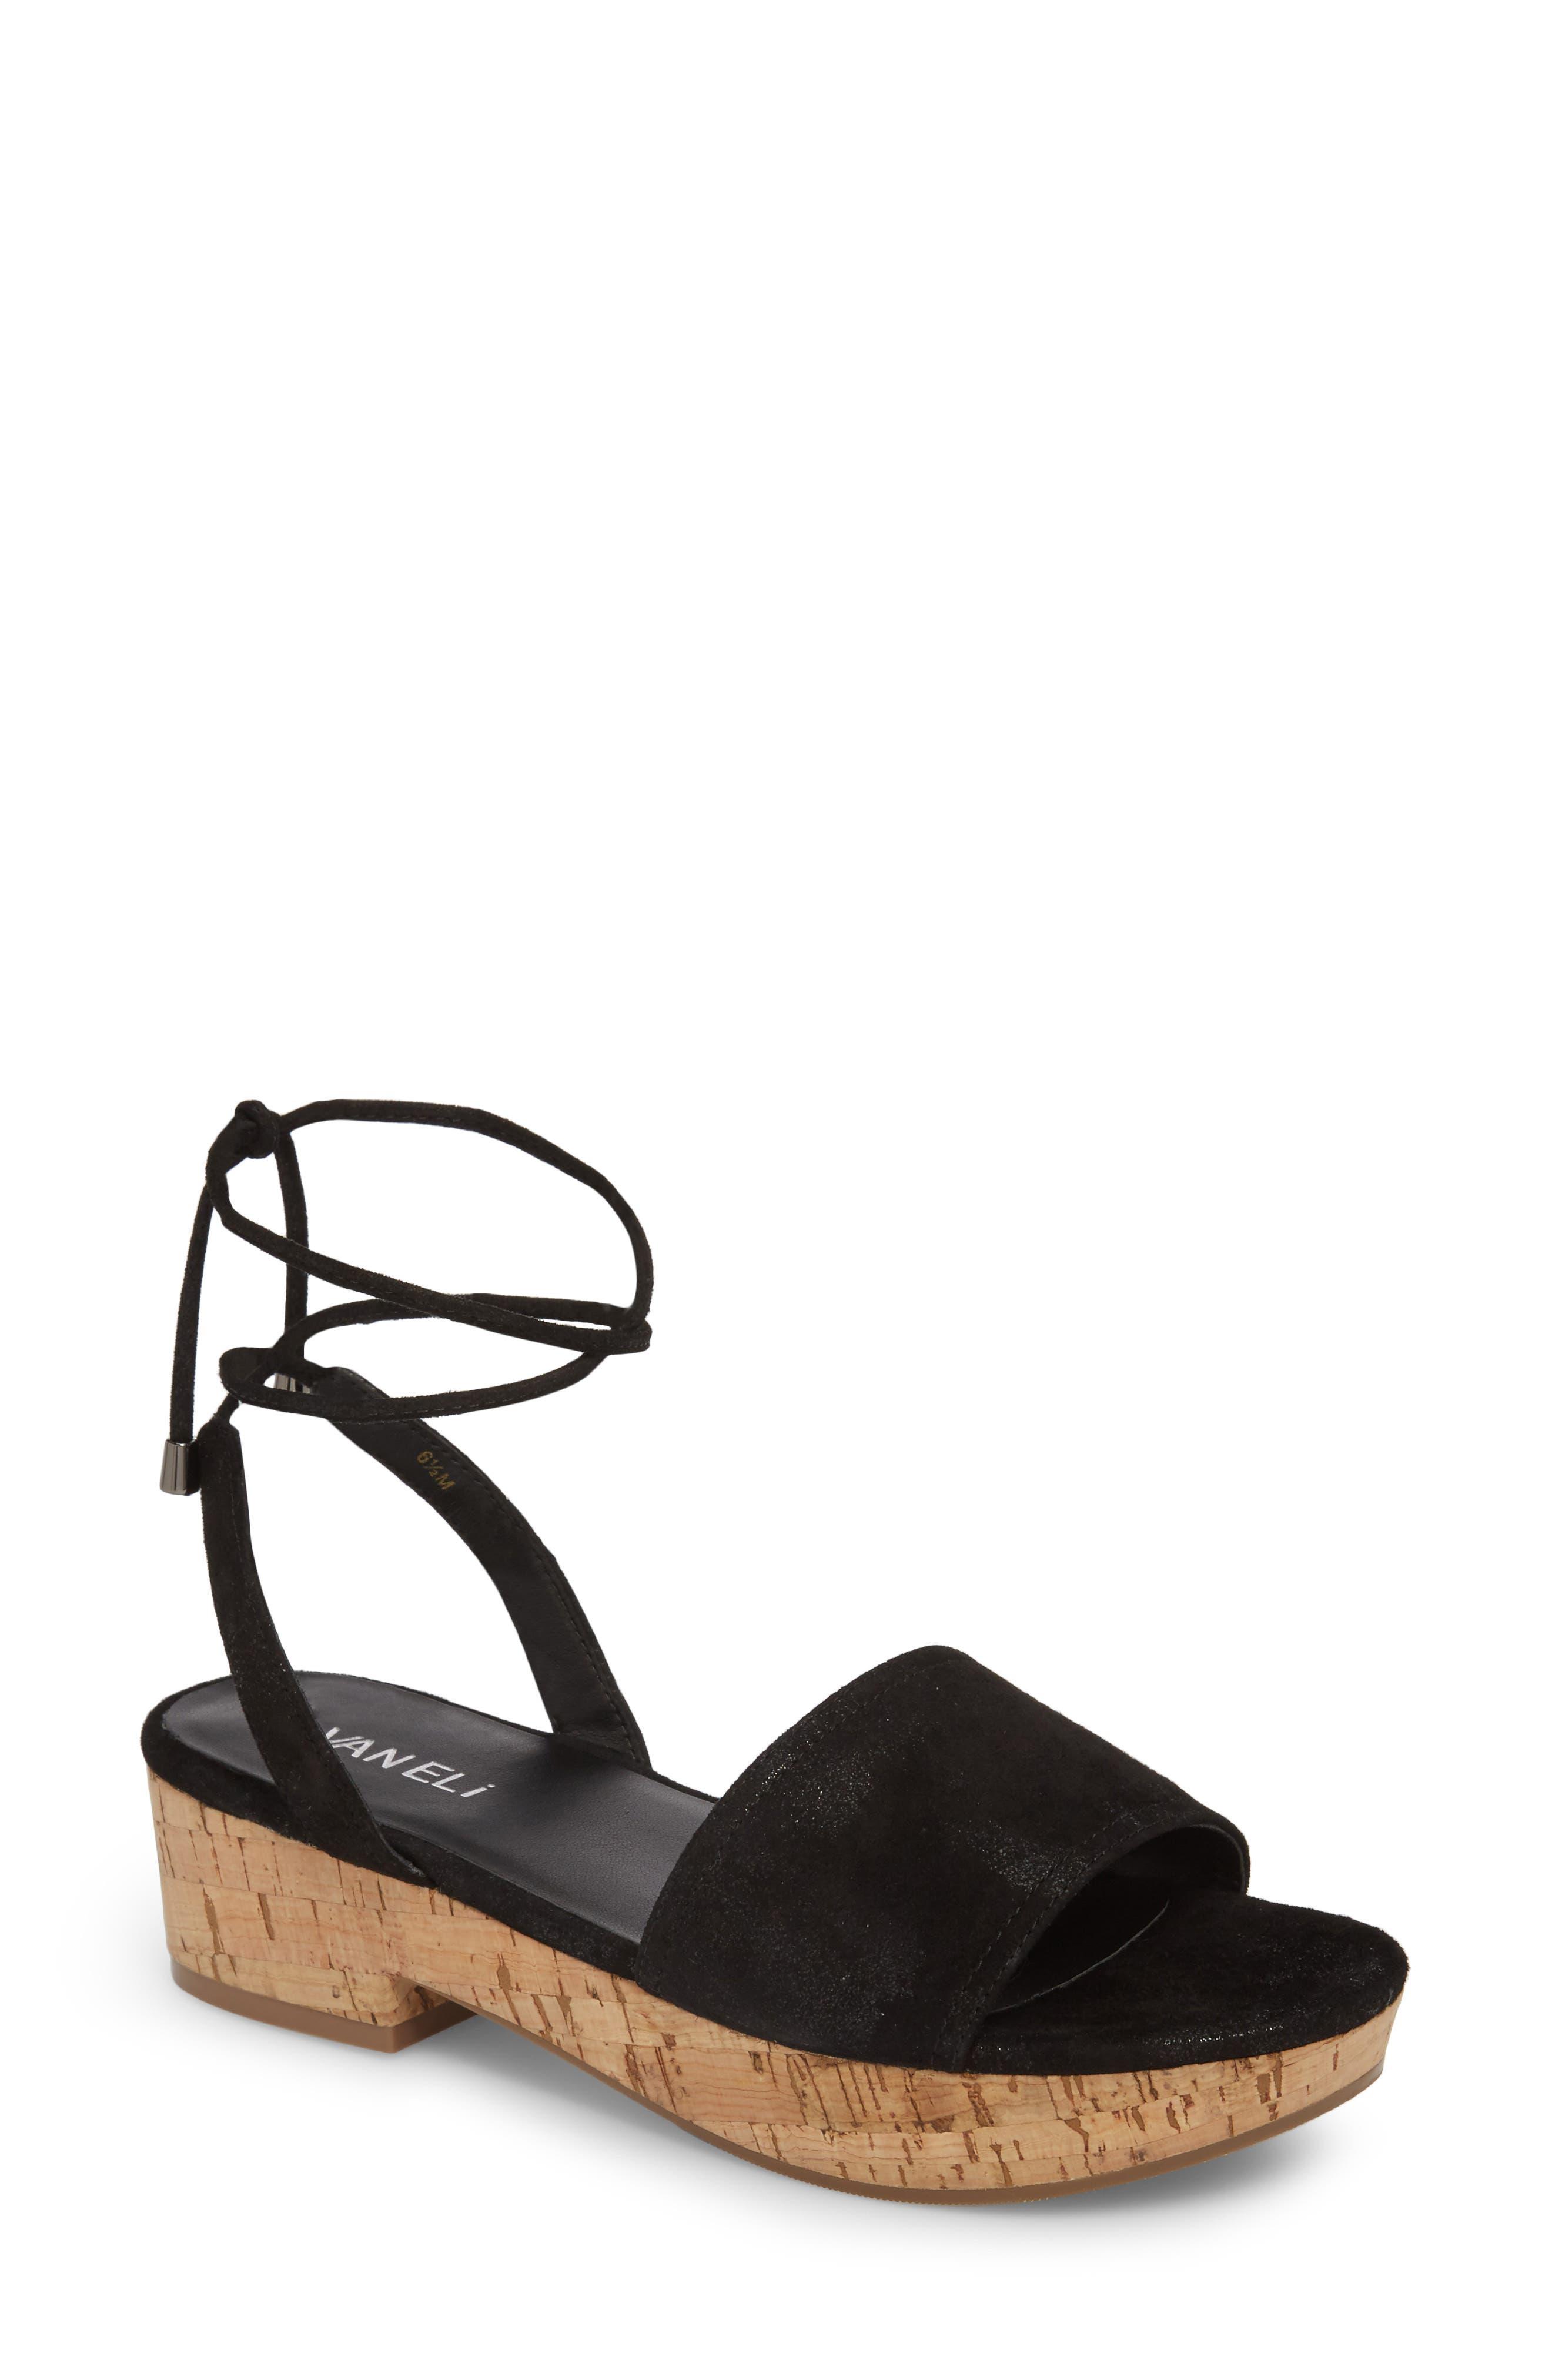 Saba Platform Sandal,                             Main thumbnail 1, color,                             Black Printed Suede